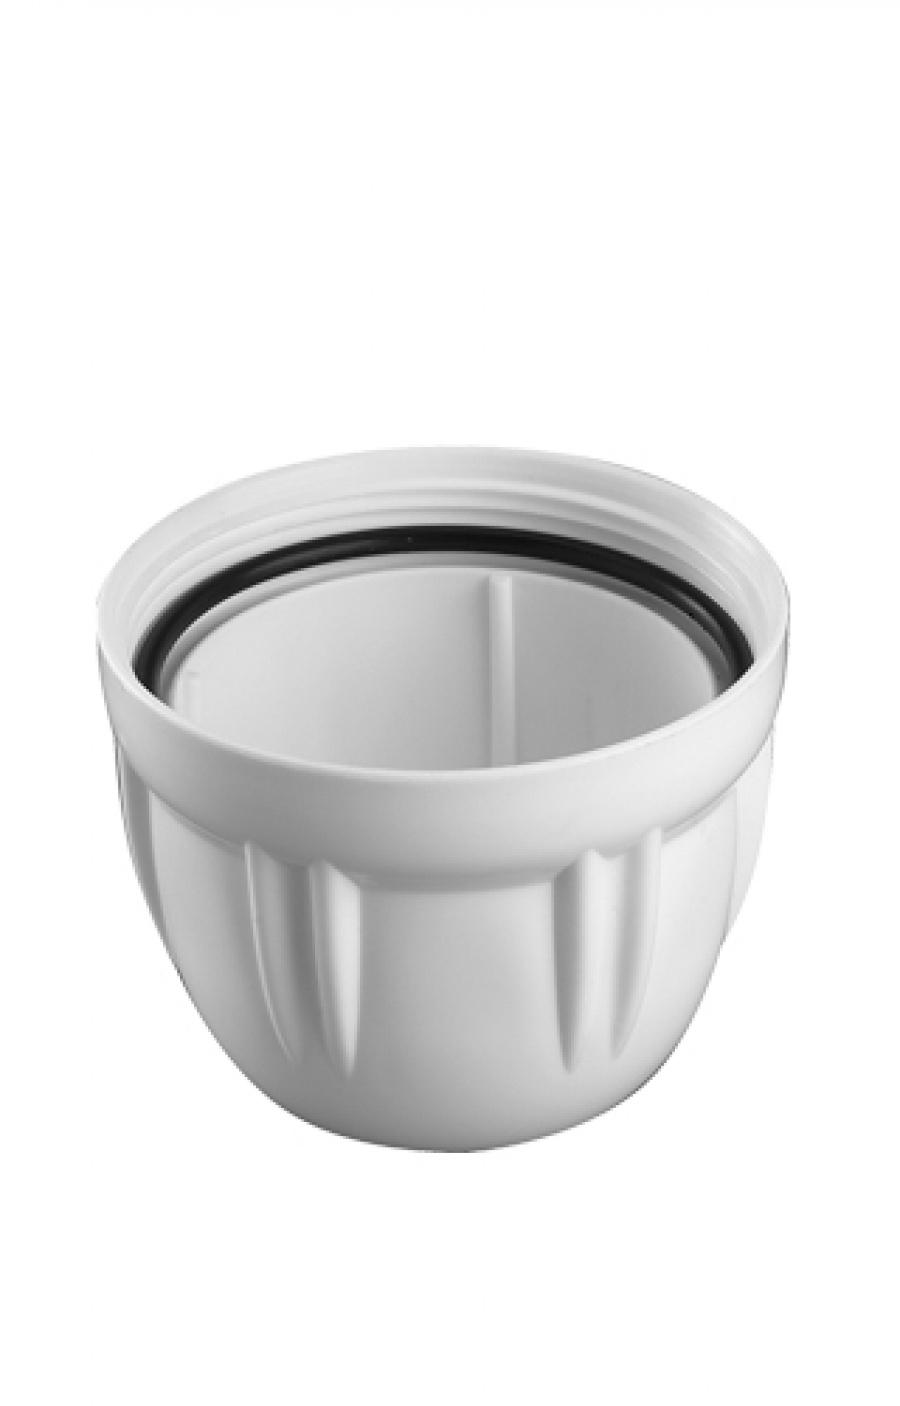 siphon lavabo pvc 6107 joint int gr. Black Bedroom Furniture Sets. Home Design Ideas